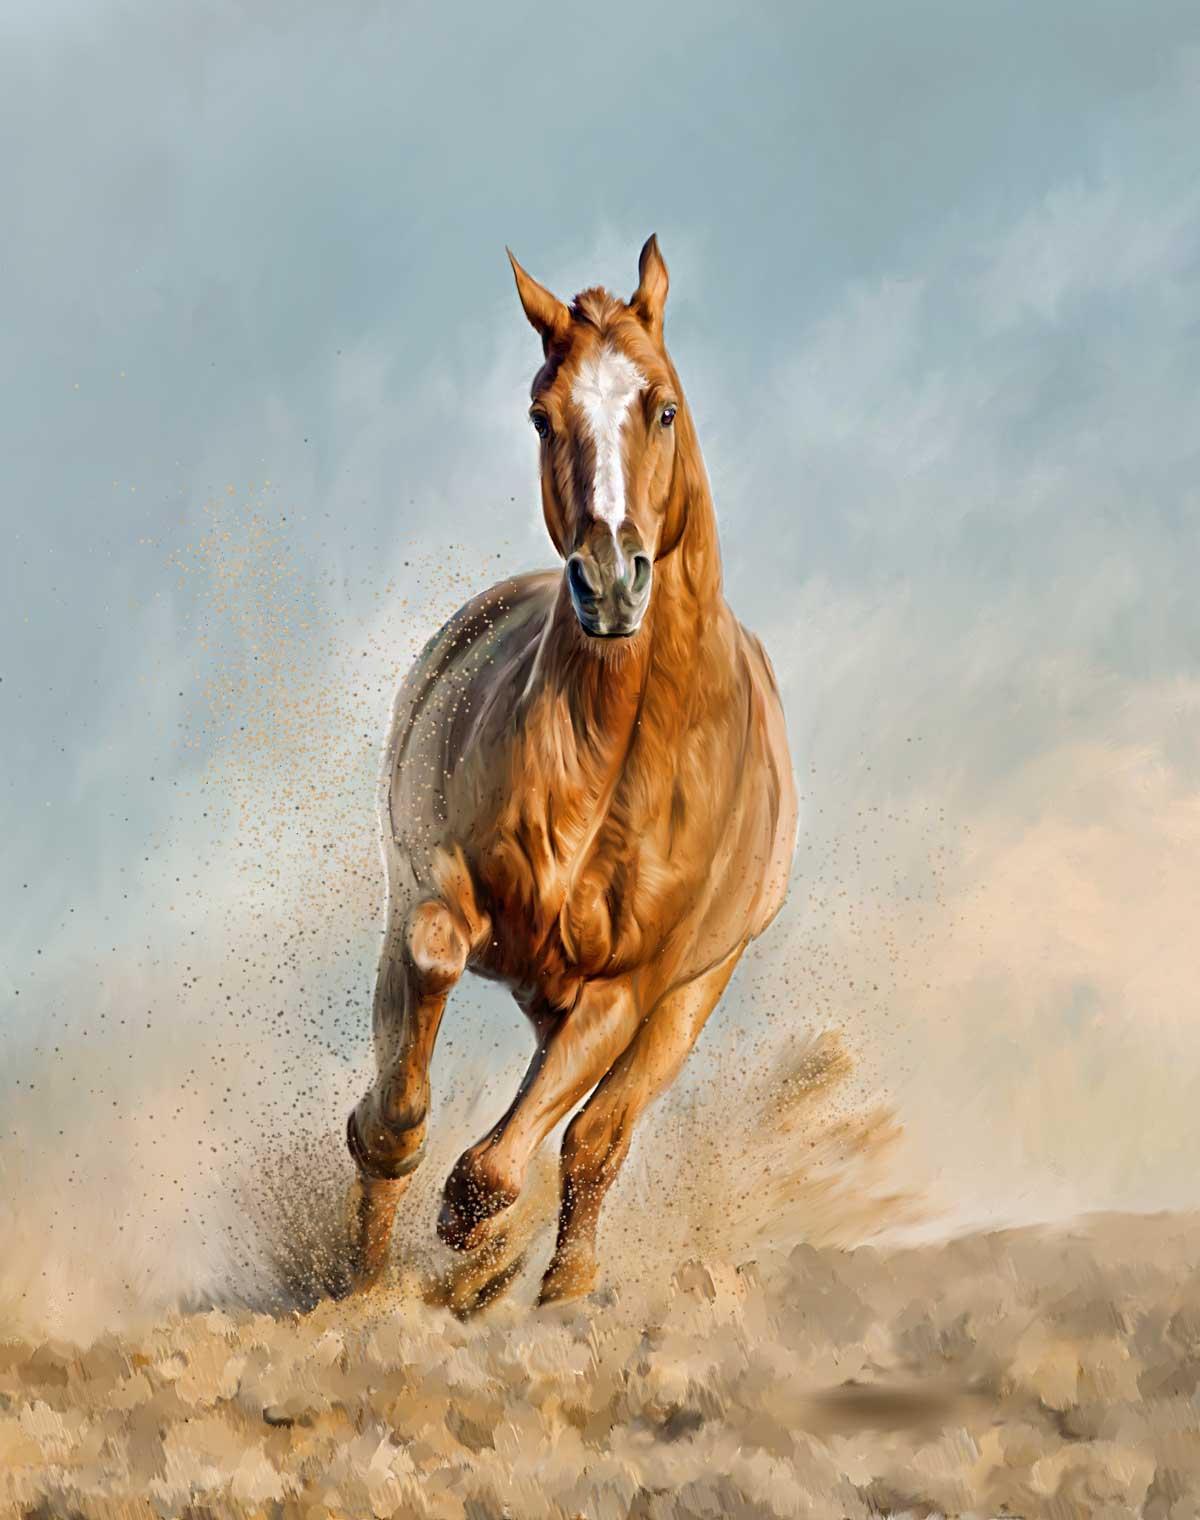 Running horse painting